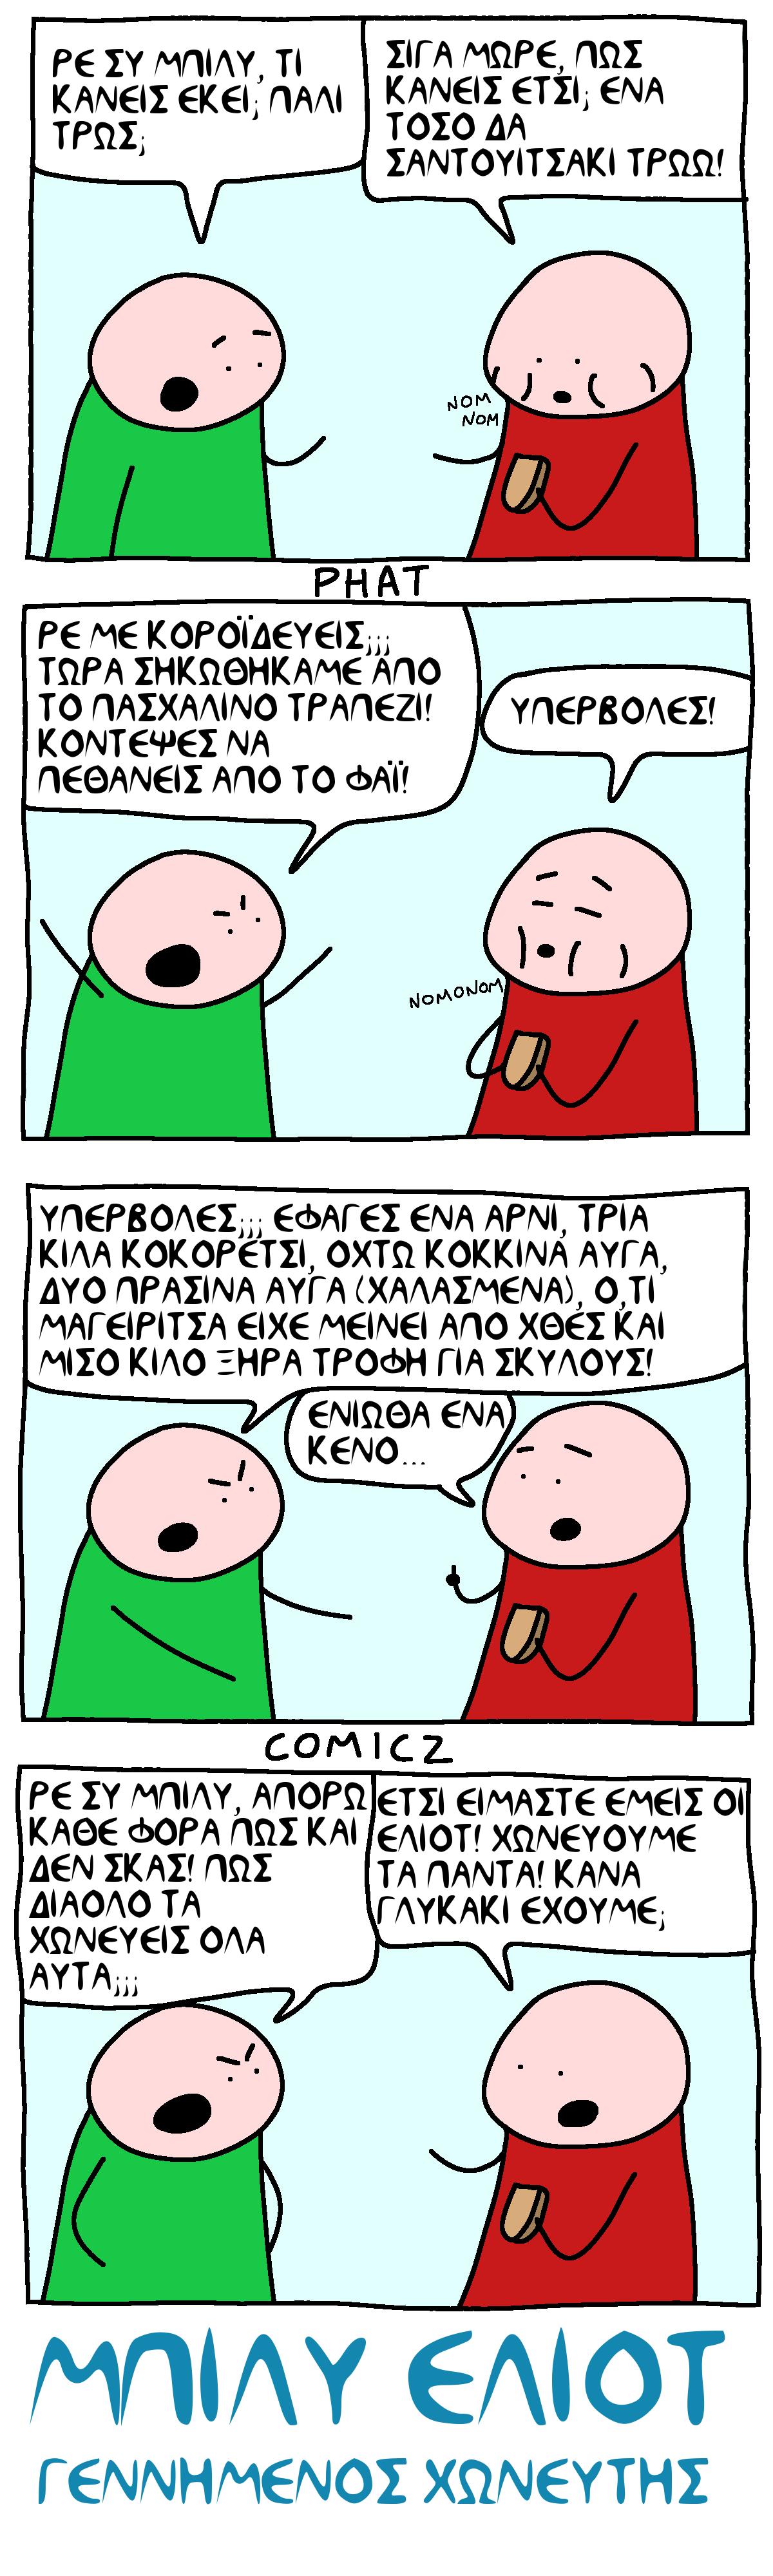 billyeliot